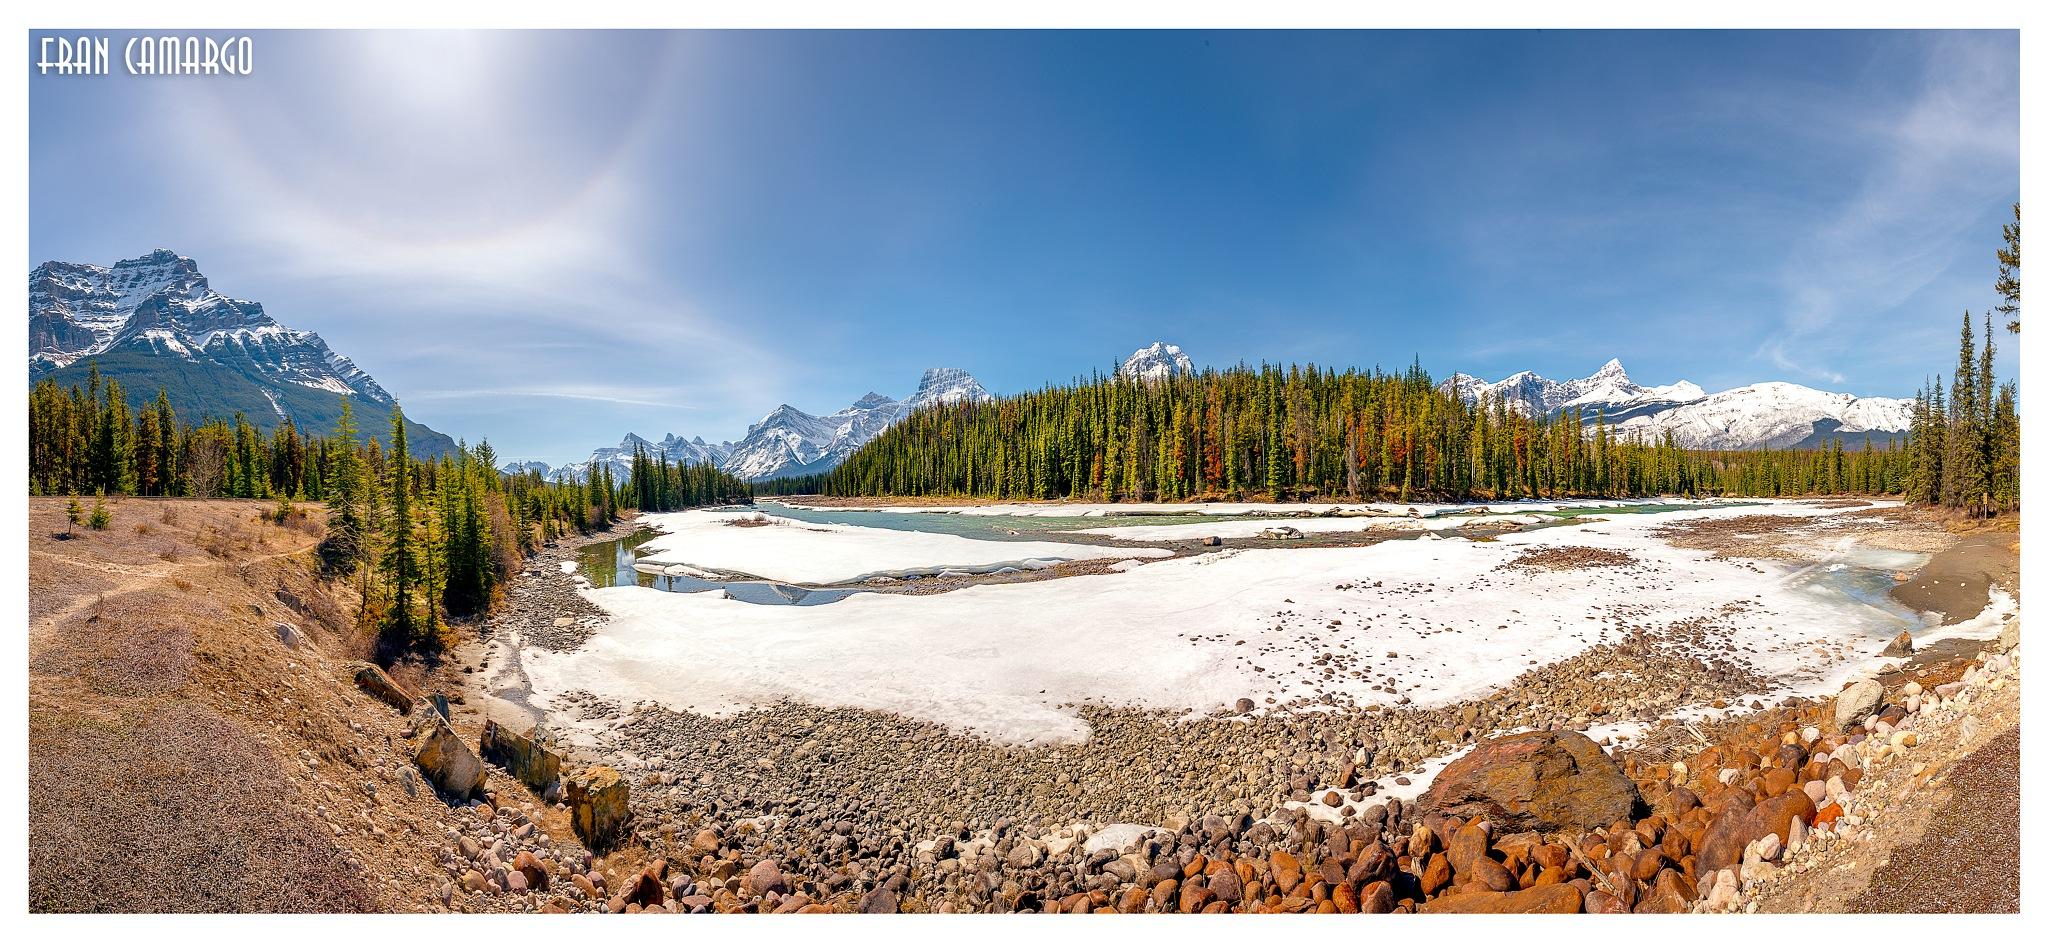 Jasper National Park - Canada by Fran Camargo